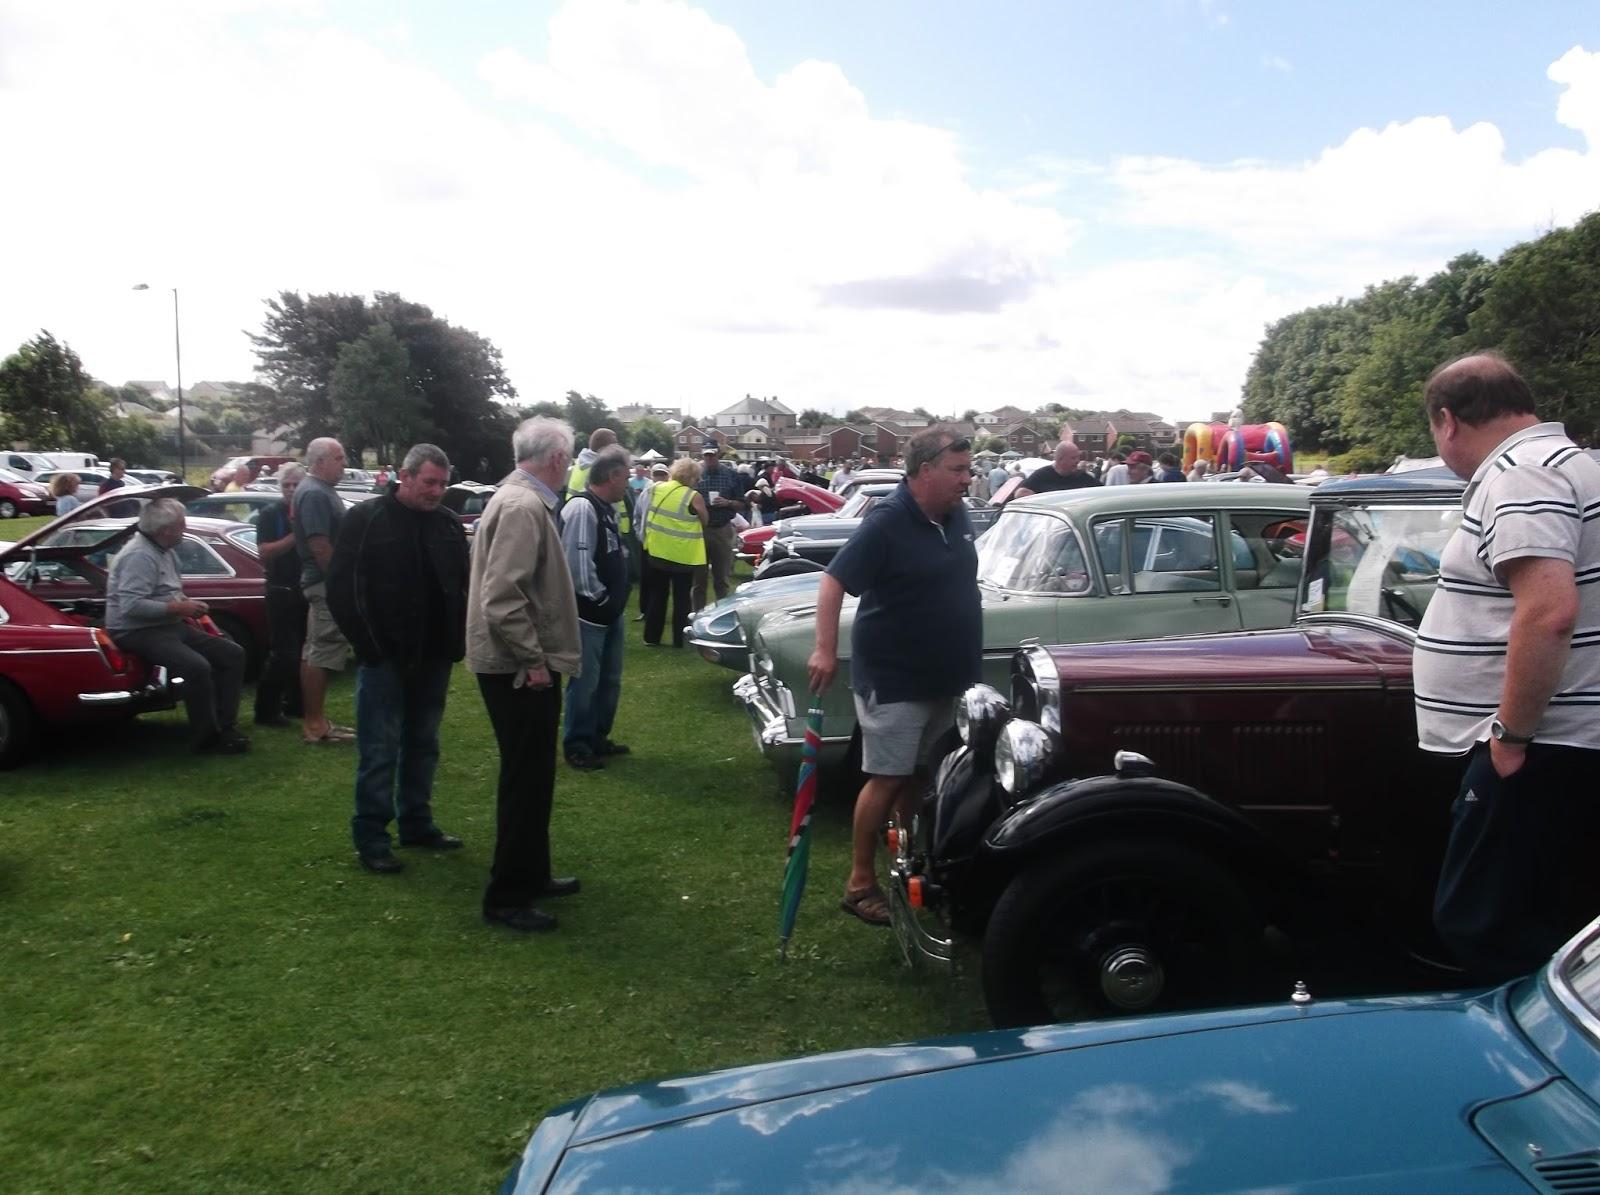 North West Images: Heysham Classic Car & Bike Show: Part 1 of 2